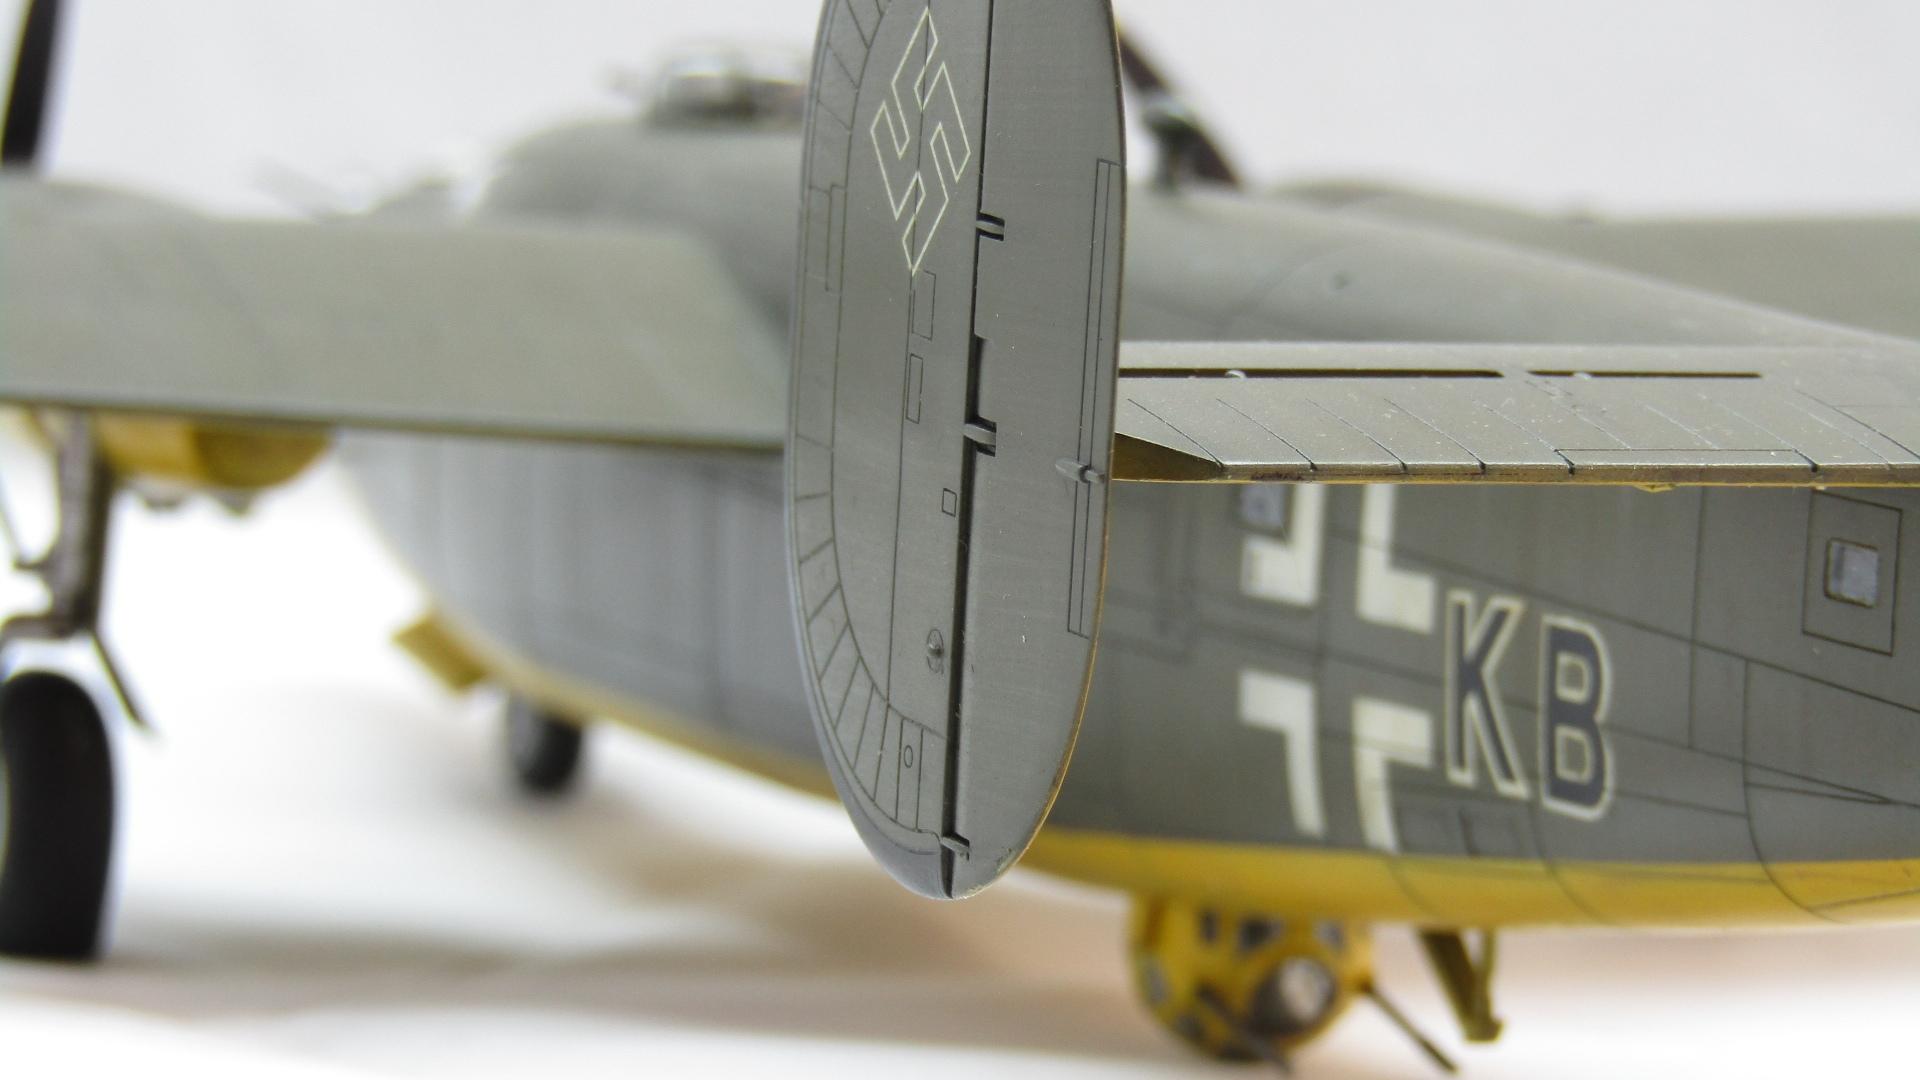 B-24H Liberator 1/72 (Academy) DhUfnNQE1gE